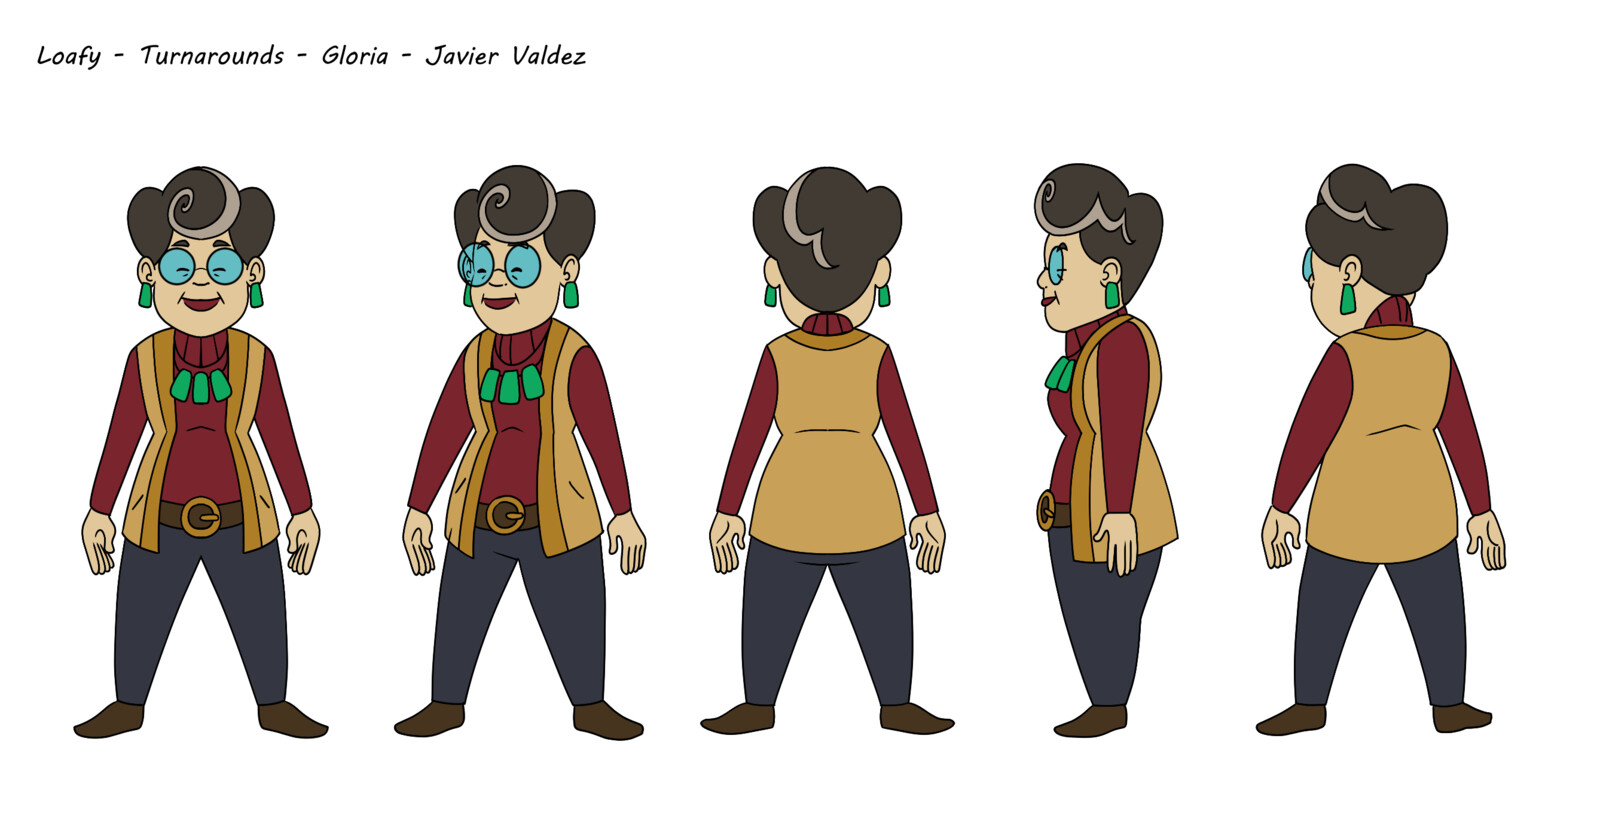 Gloria, voiced by Andrew Levitt